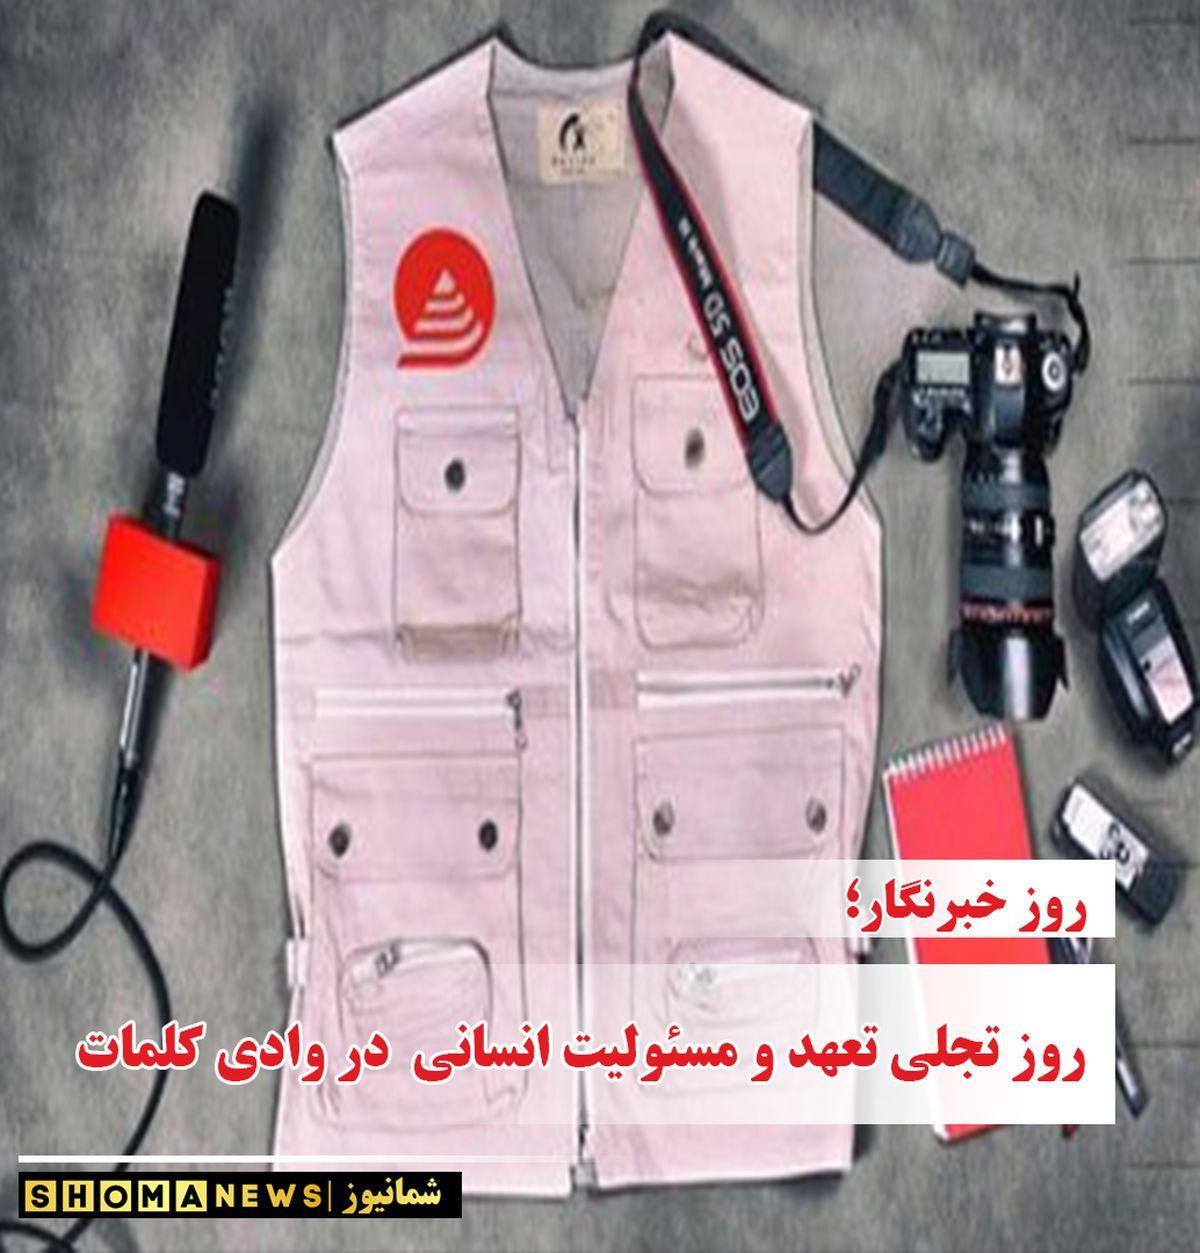 اس ام اس تبریک روز خبرنگار + عکس نوشته